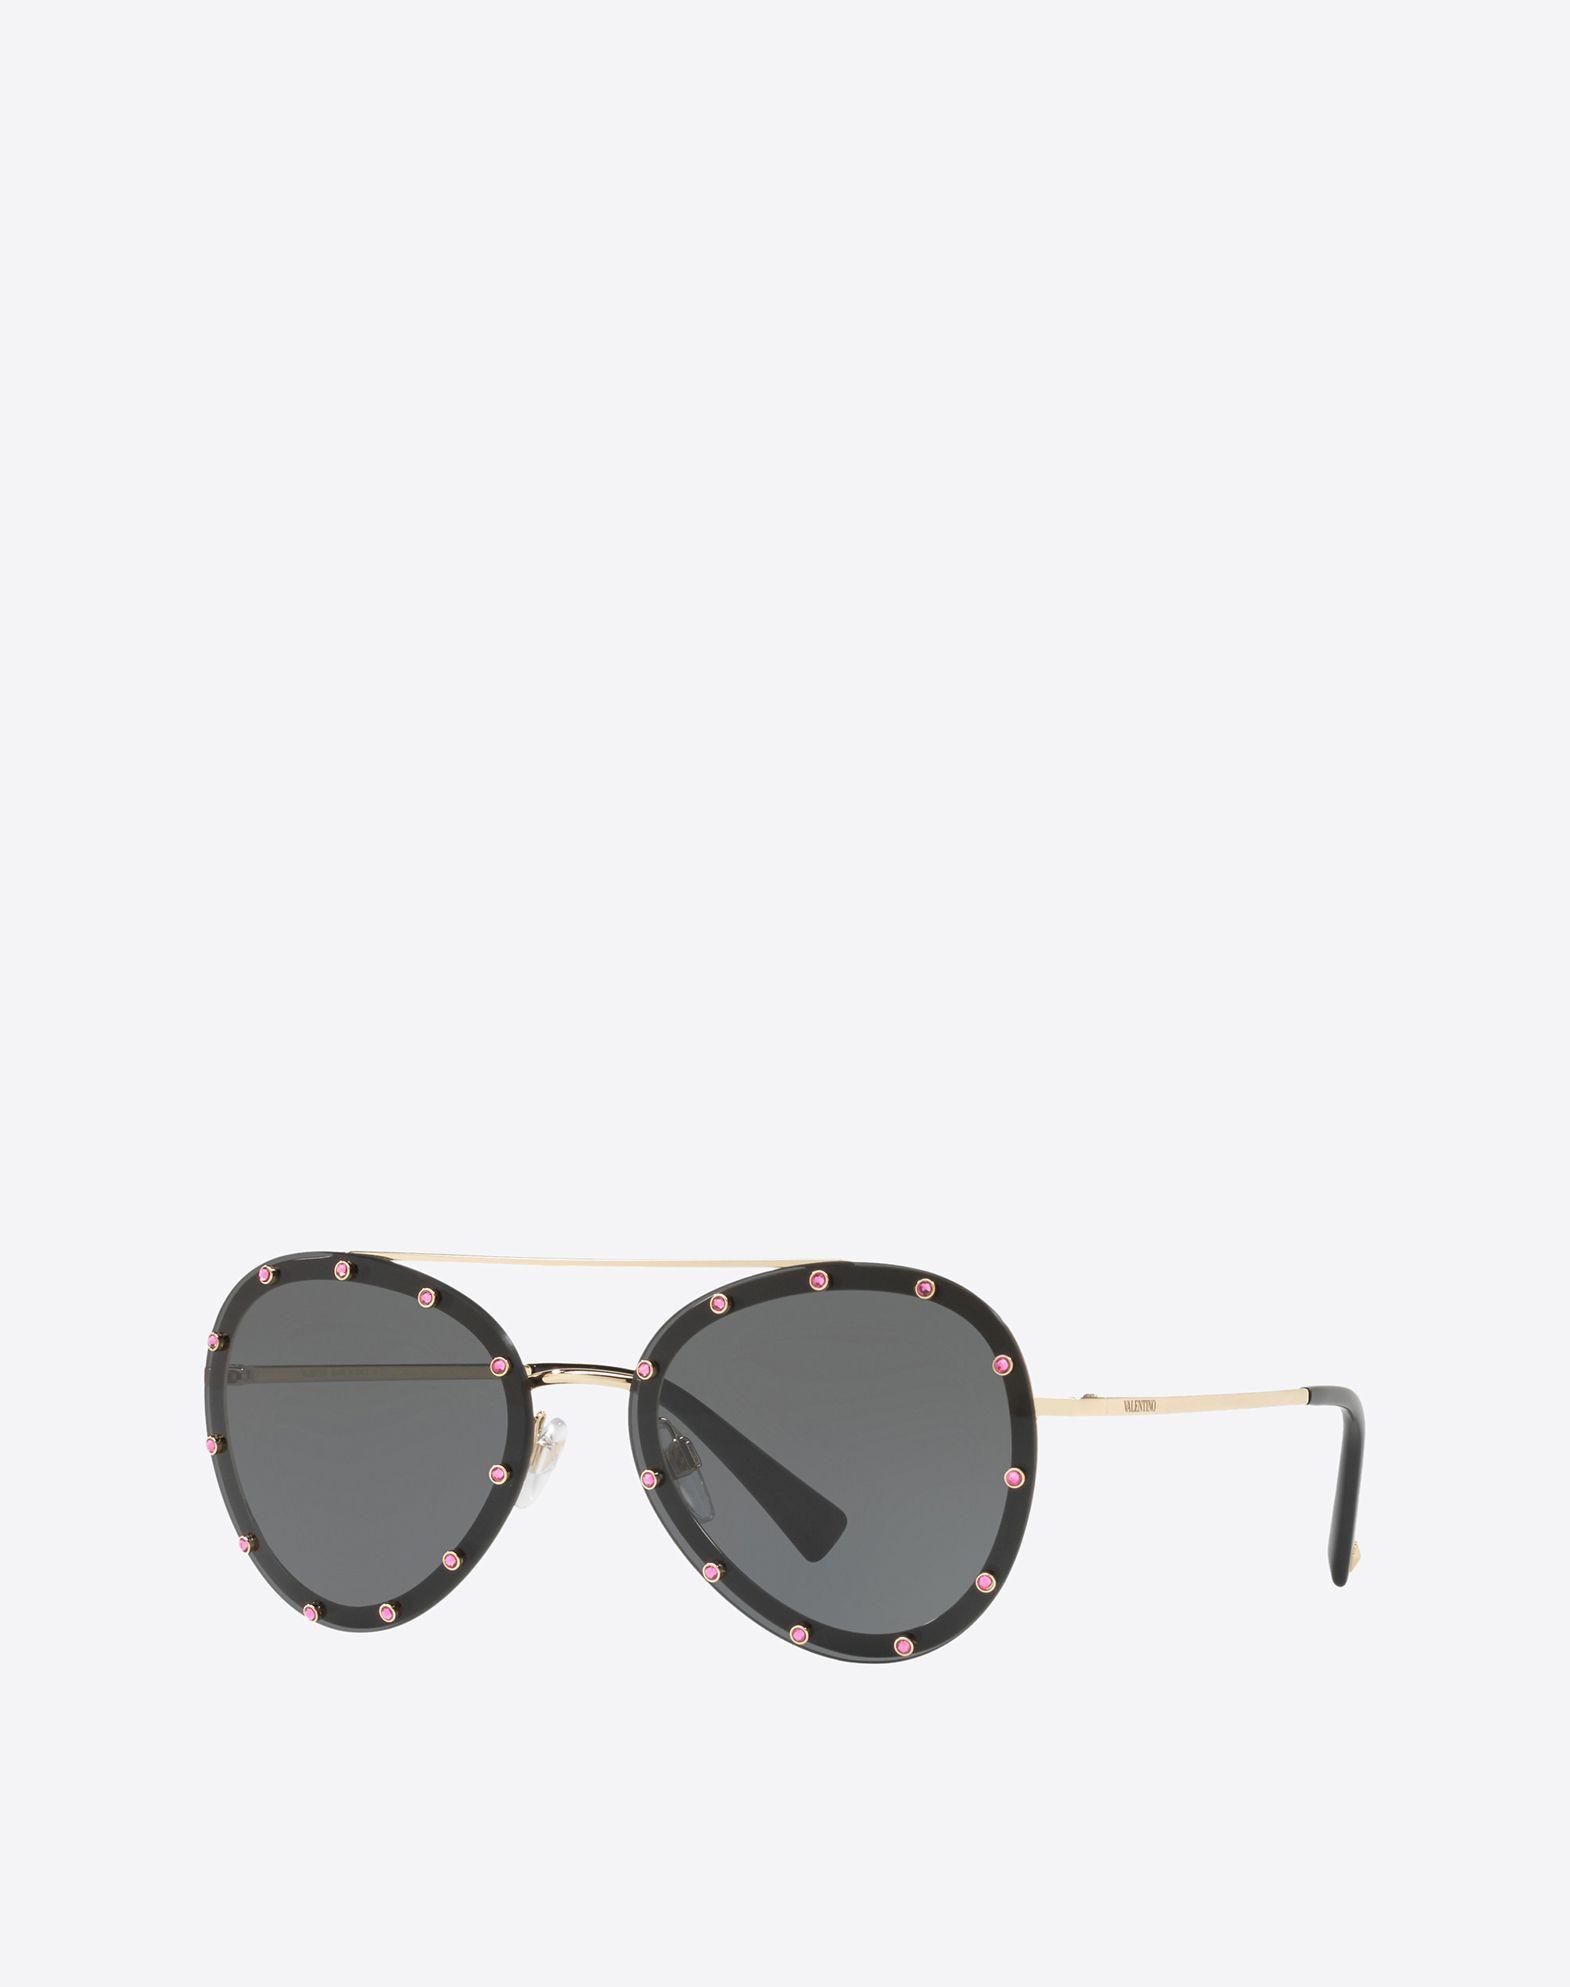 VALENTINO Metal and Acetate Sunglasses Sunglasses E r